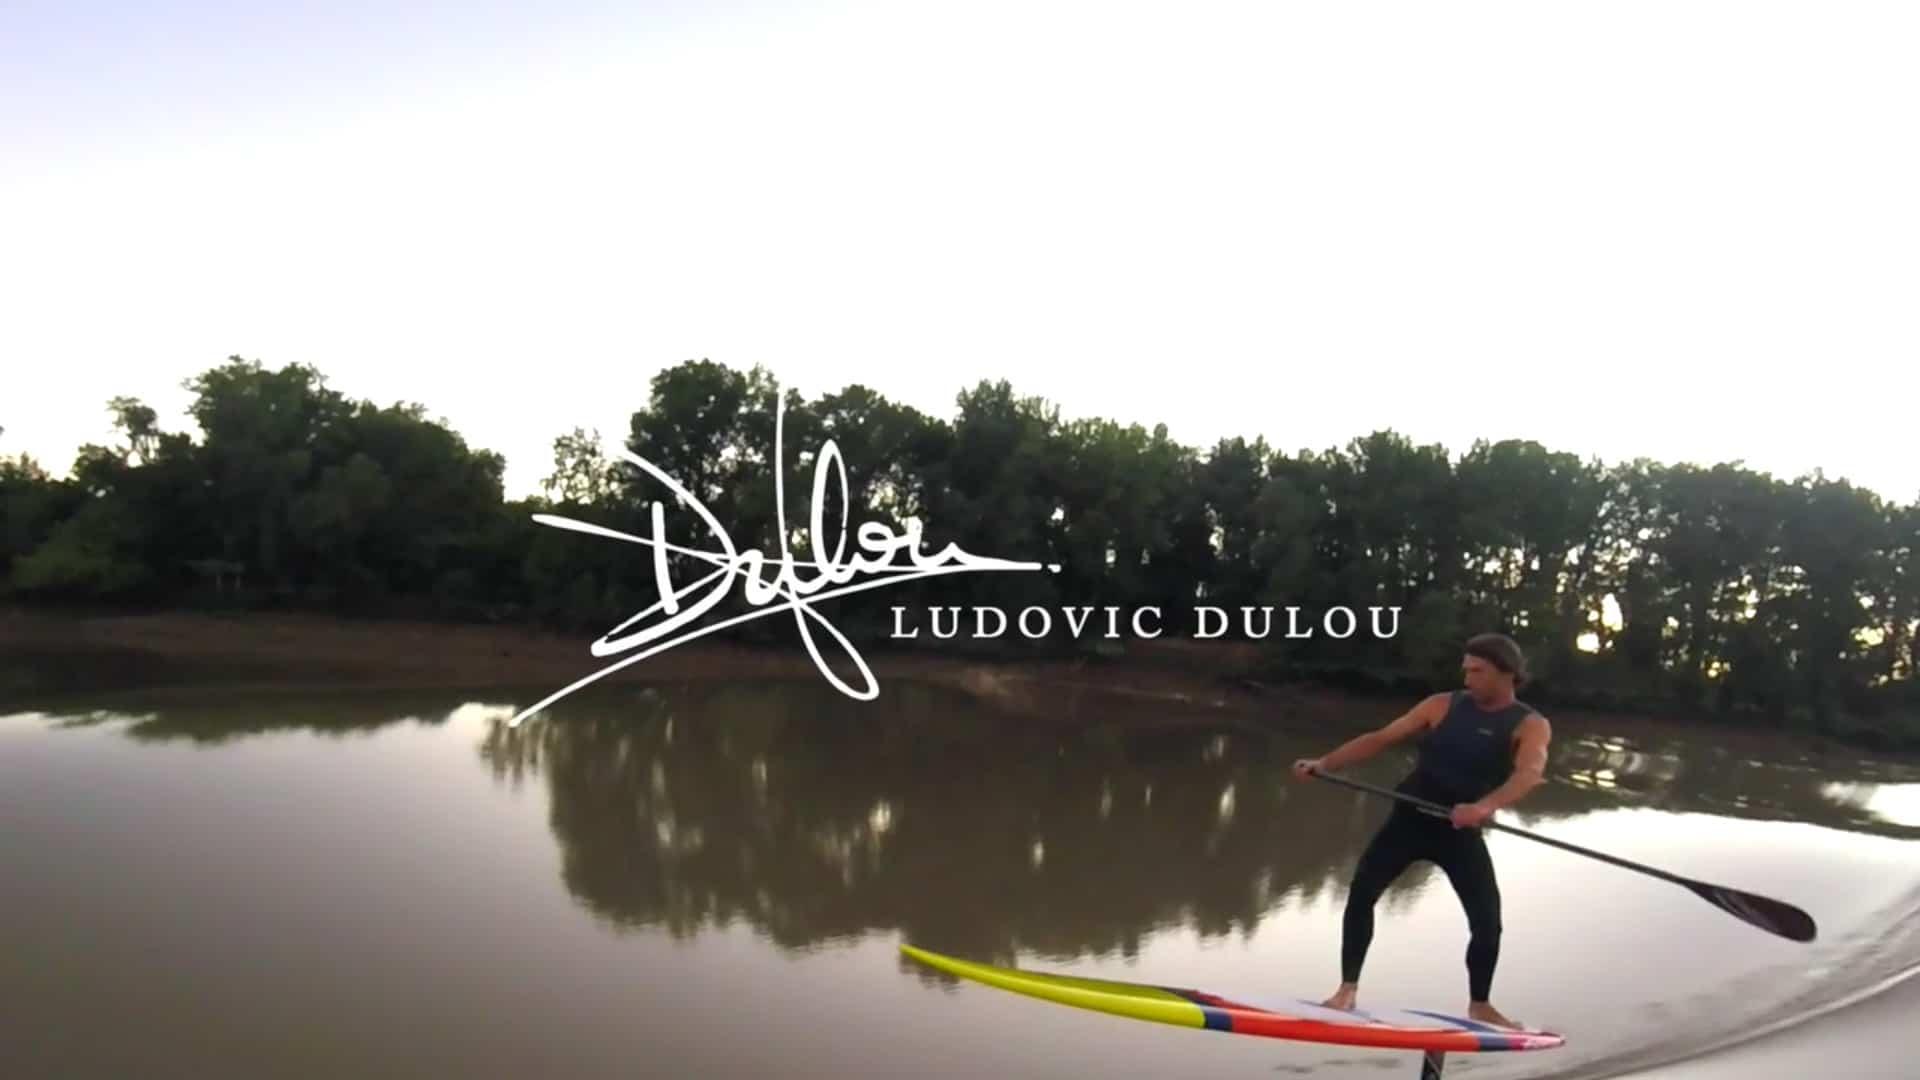 ludovic-dulou-surf-mascaret-sup-foil-1